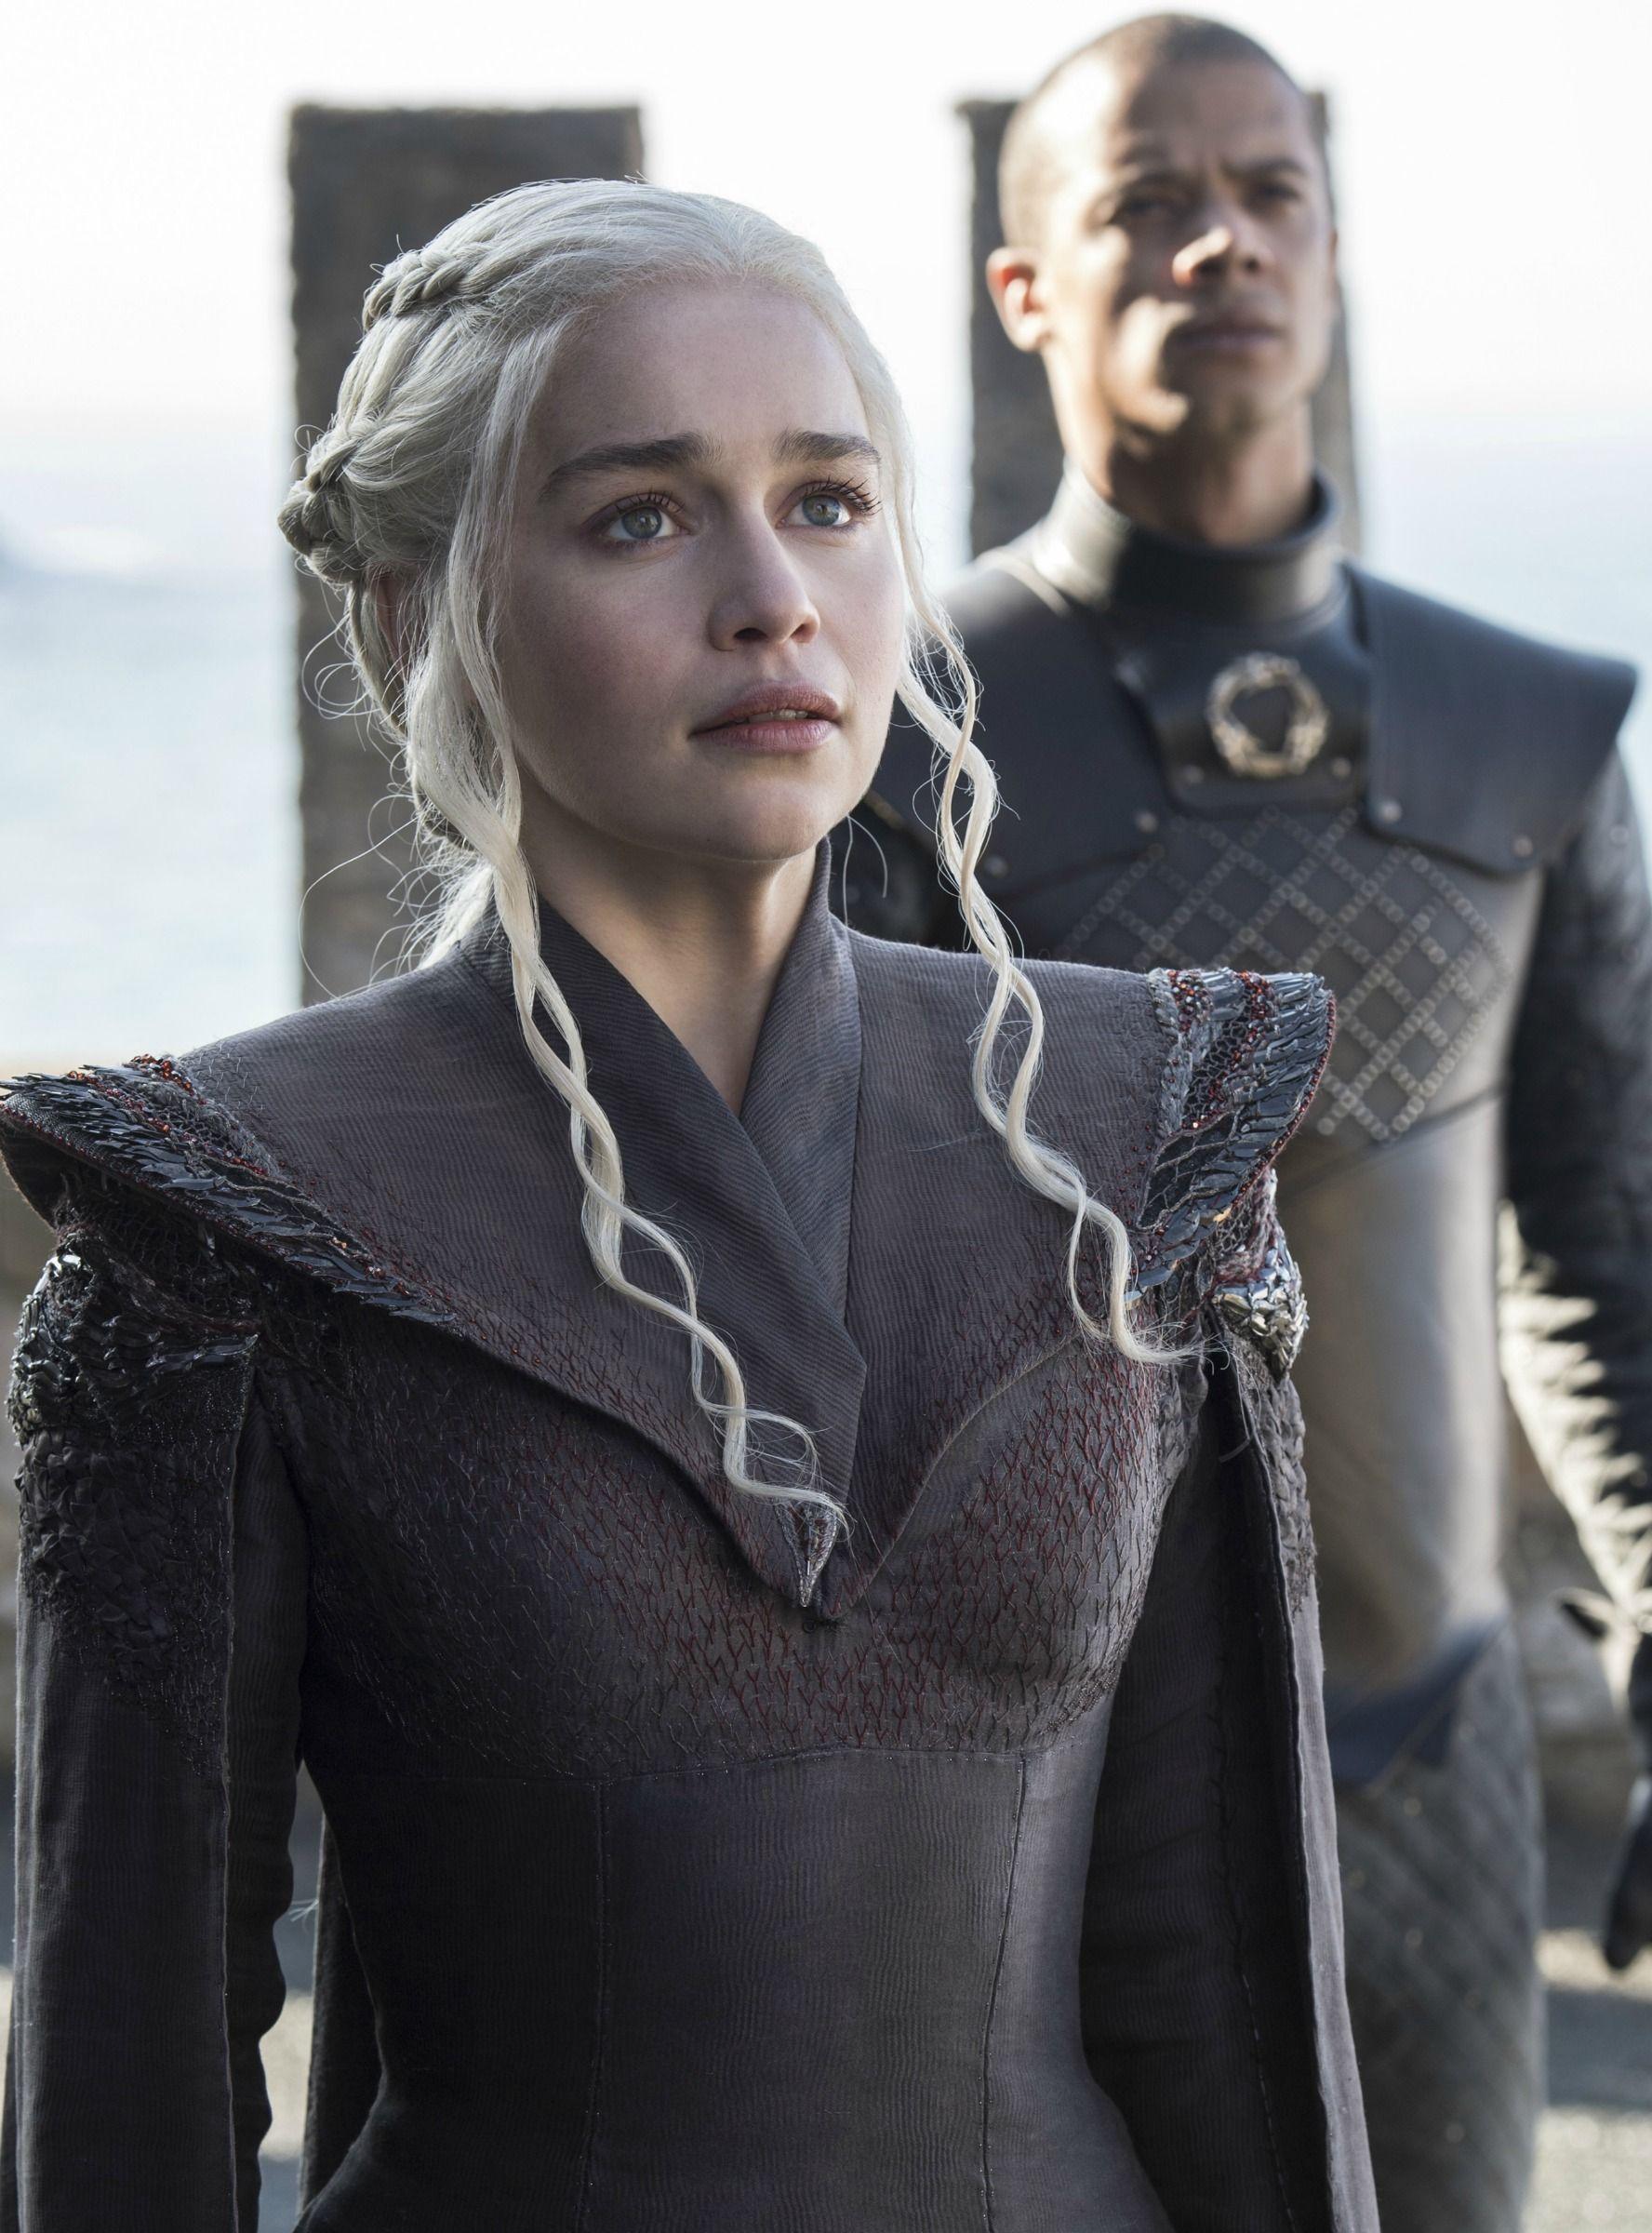 What S Next For Leading Game Of Thrones Ship Jon Snow Daenerys Targaryen Sezony Igra Prestolov Geroi